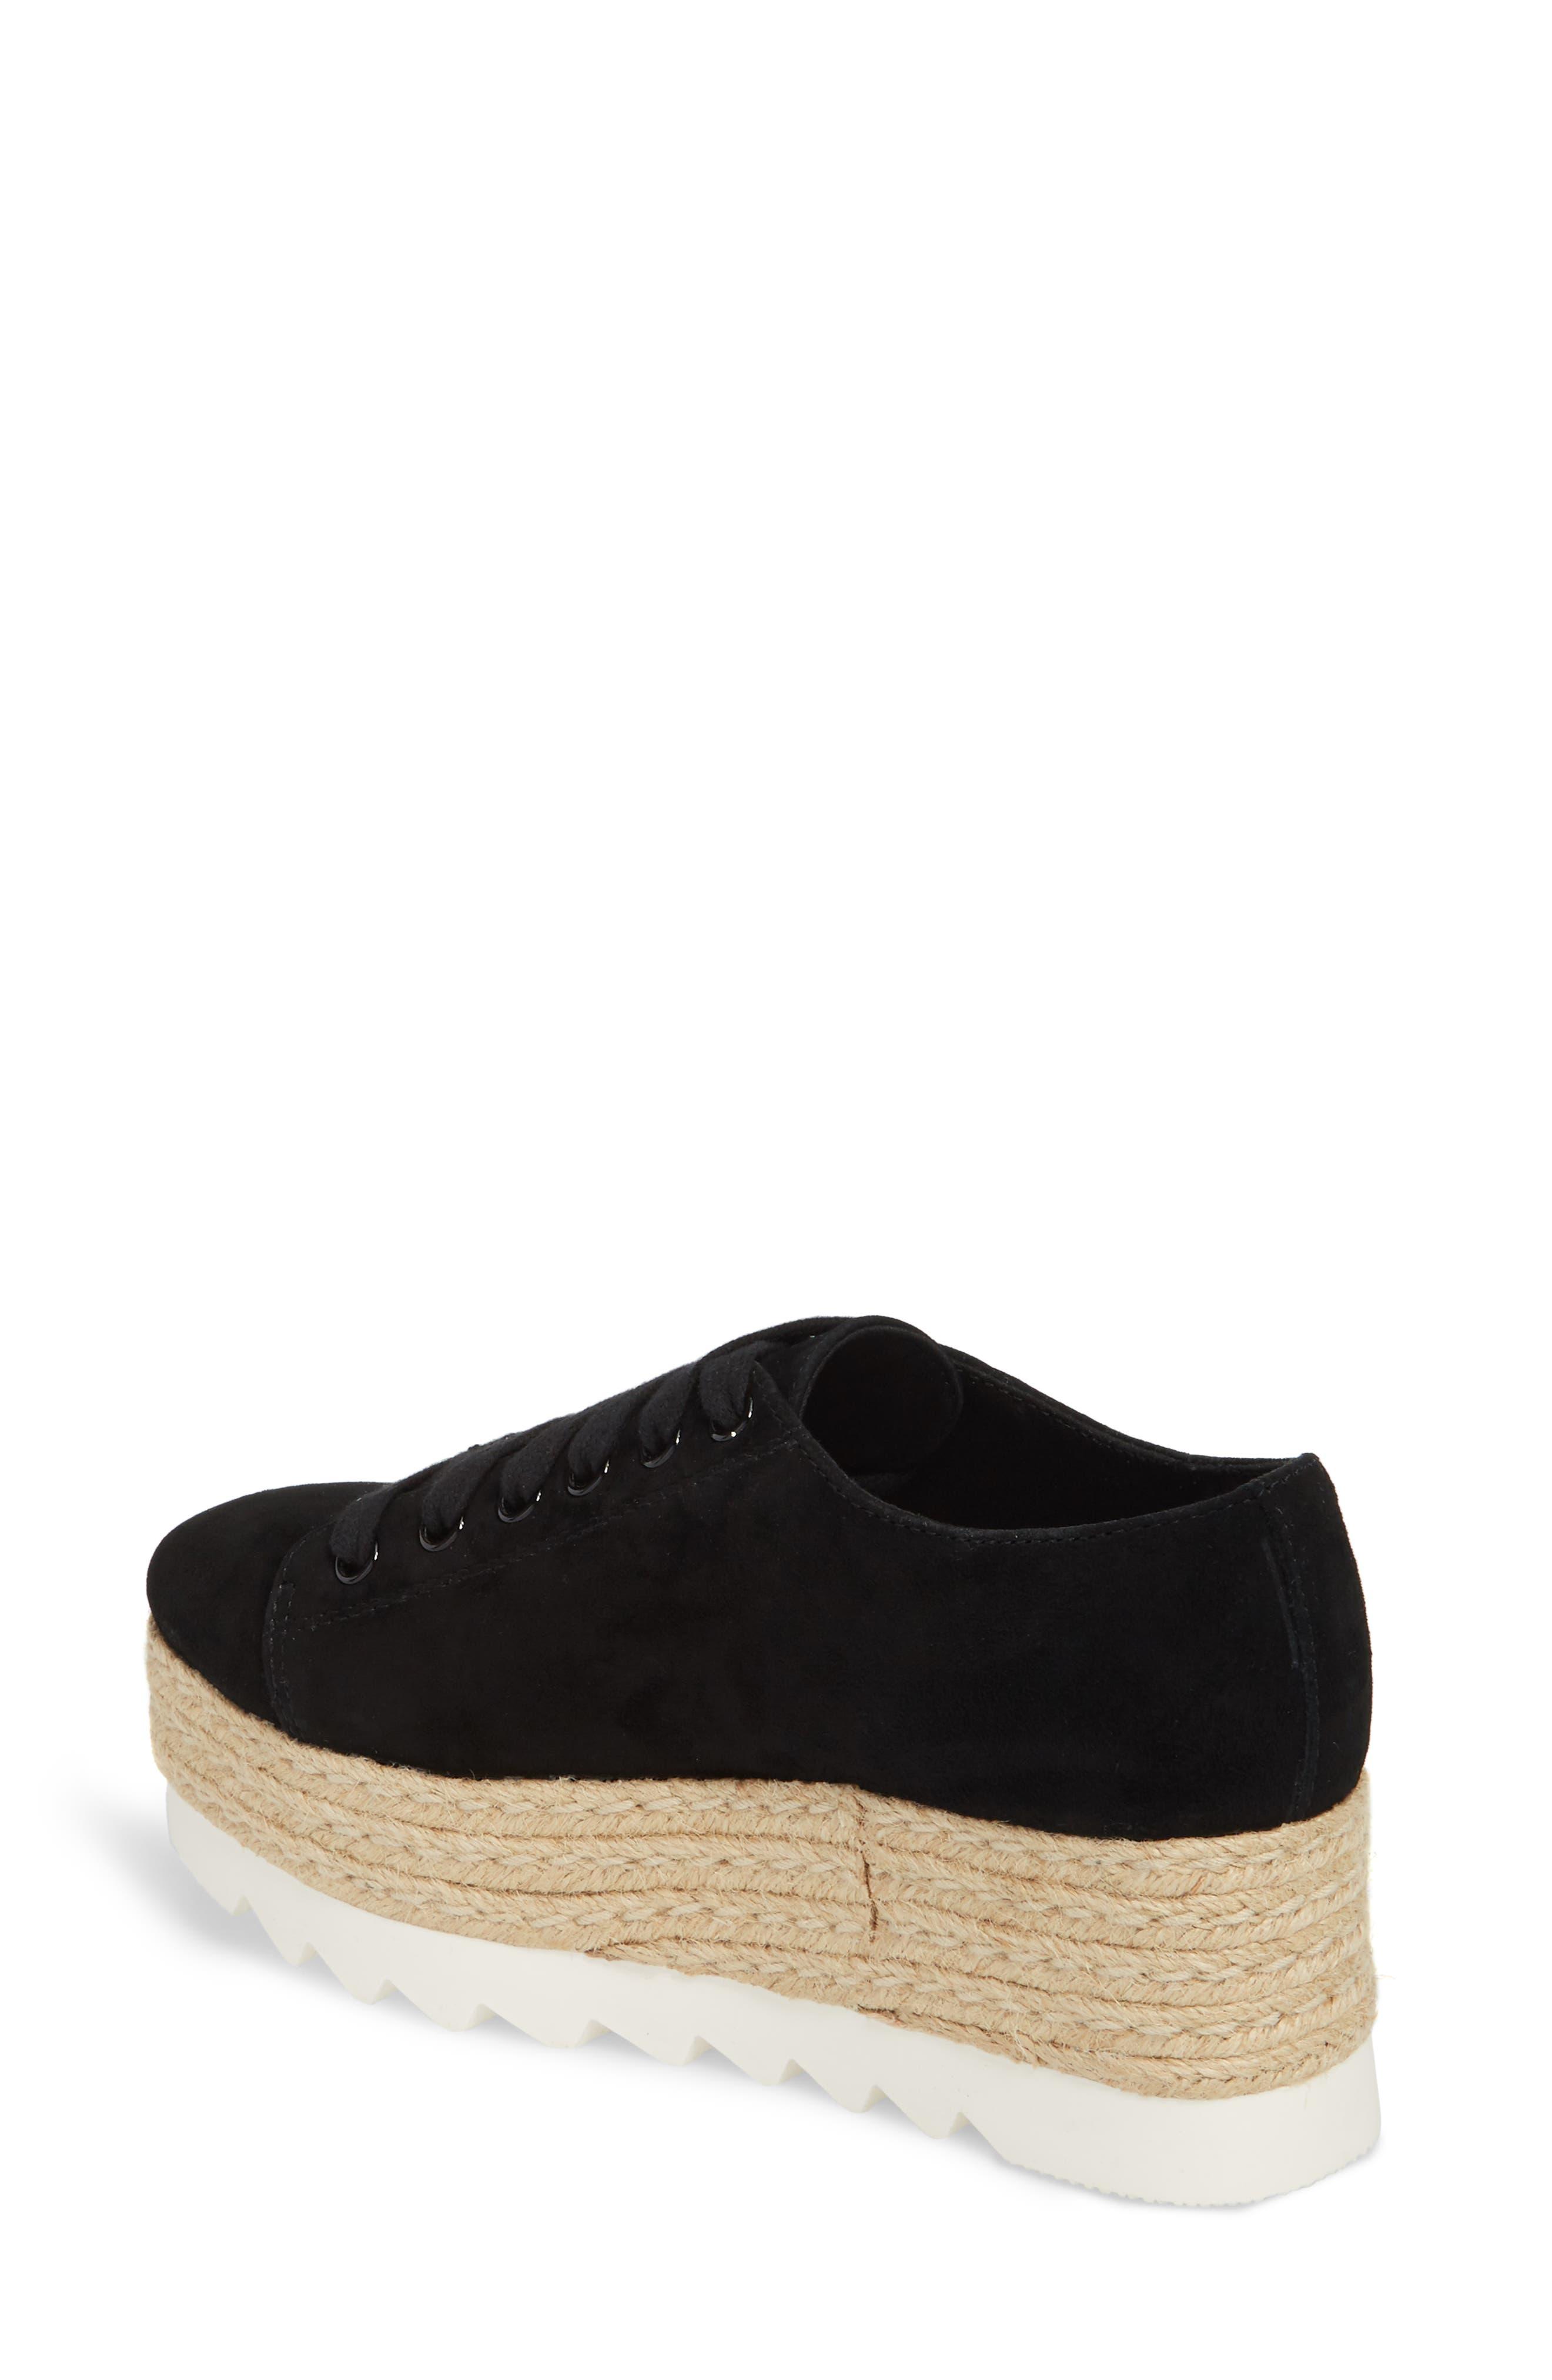 Karma Espadrille Platform Sneaker,                             Alternate thumbnail 2, color,                             BLACK SUED